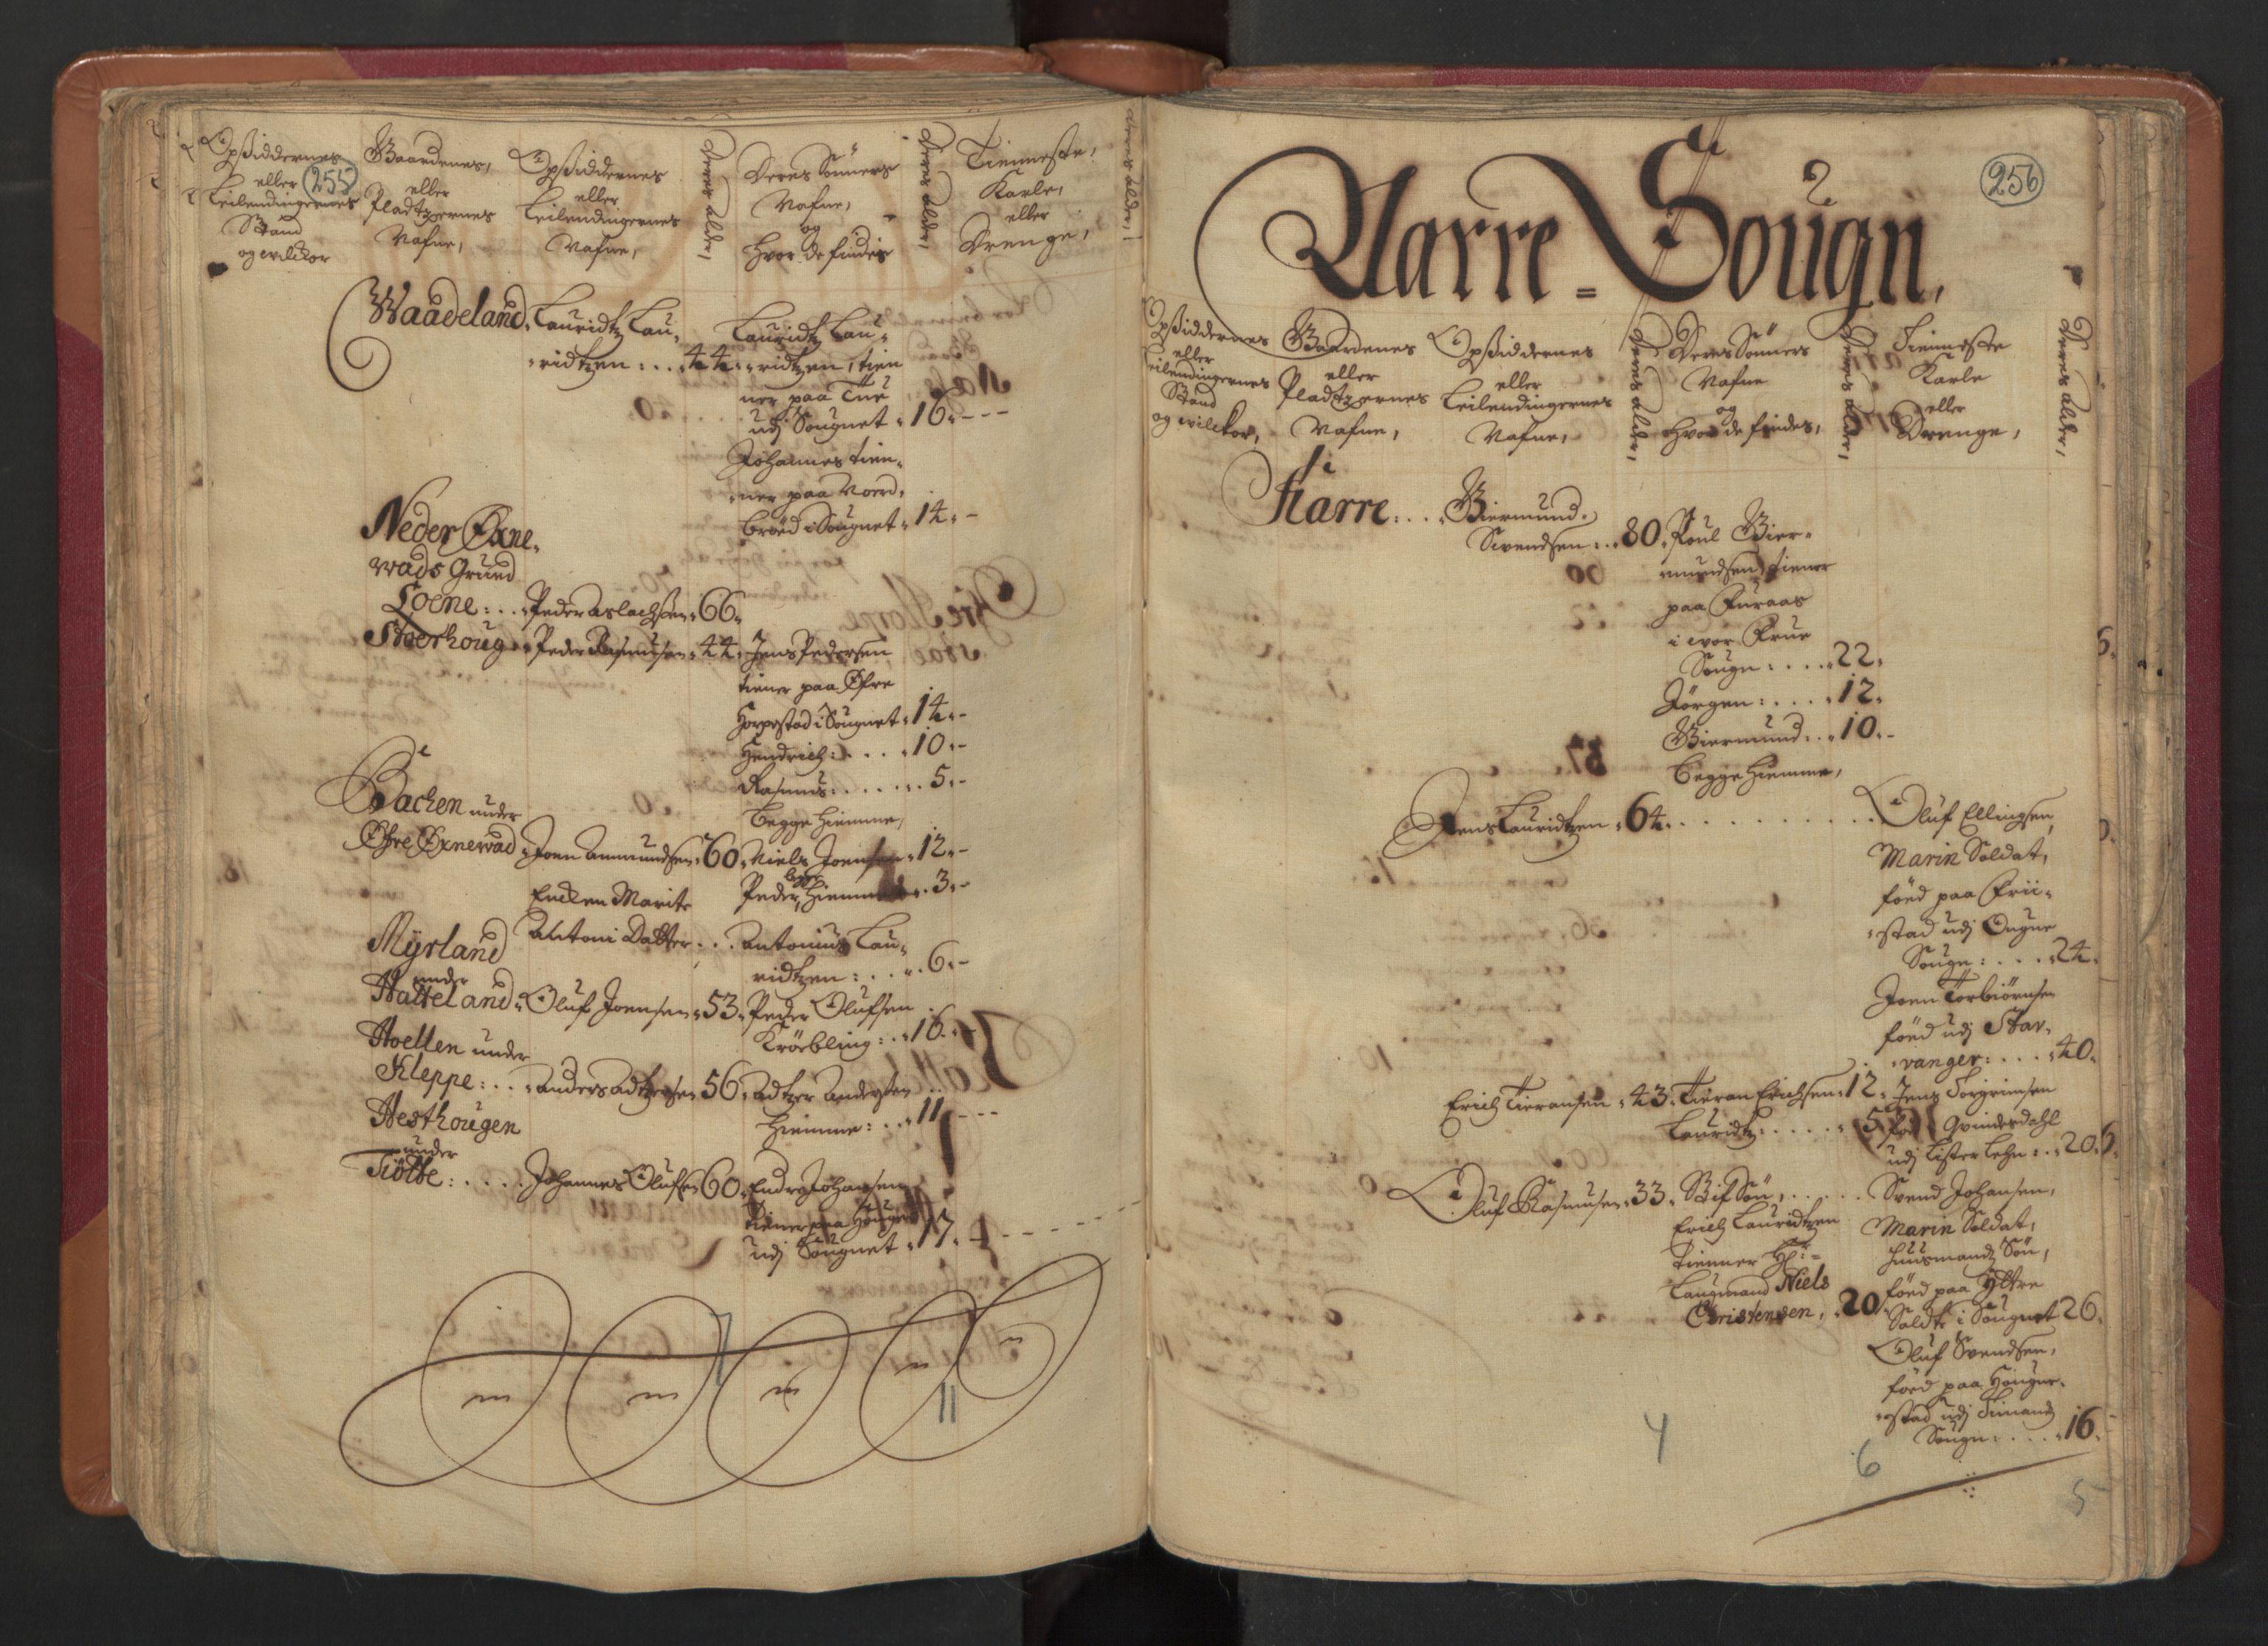 RA, Manntallet 1701, nr. 4: Jæren og Dalane fogderi, 1701, s. 255-256